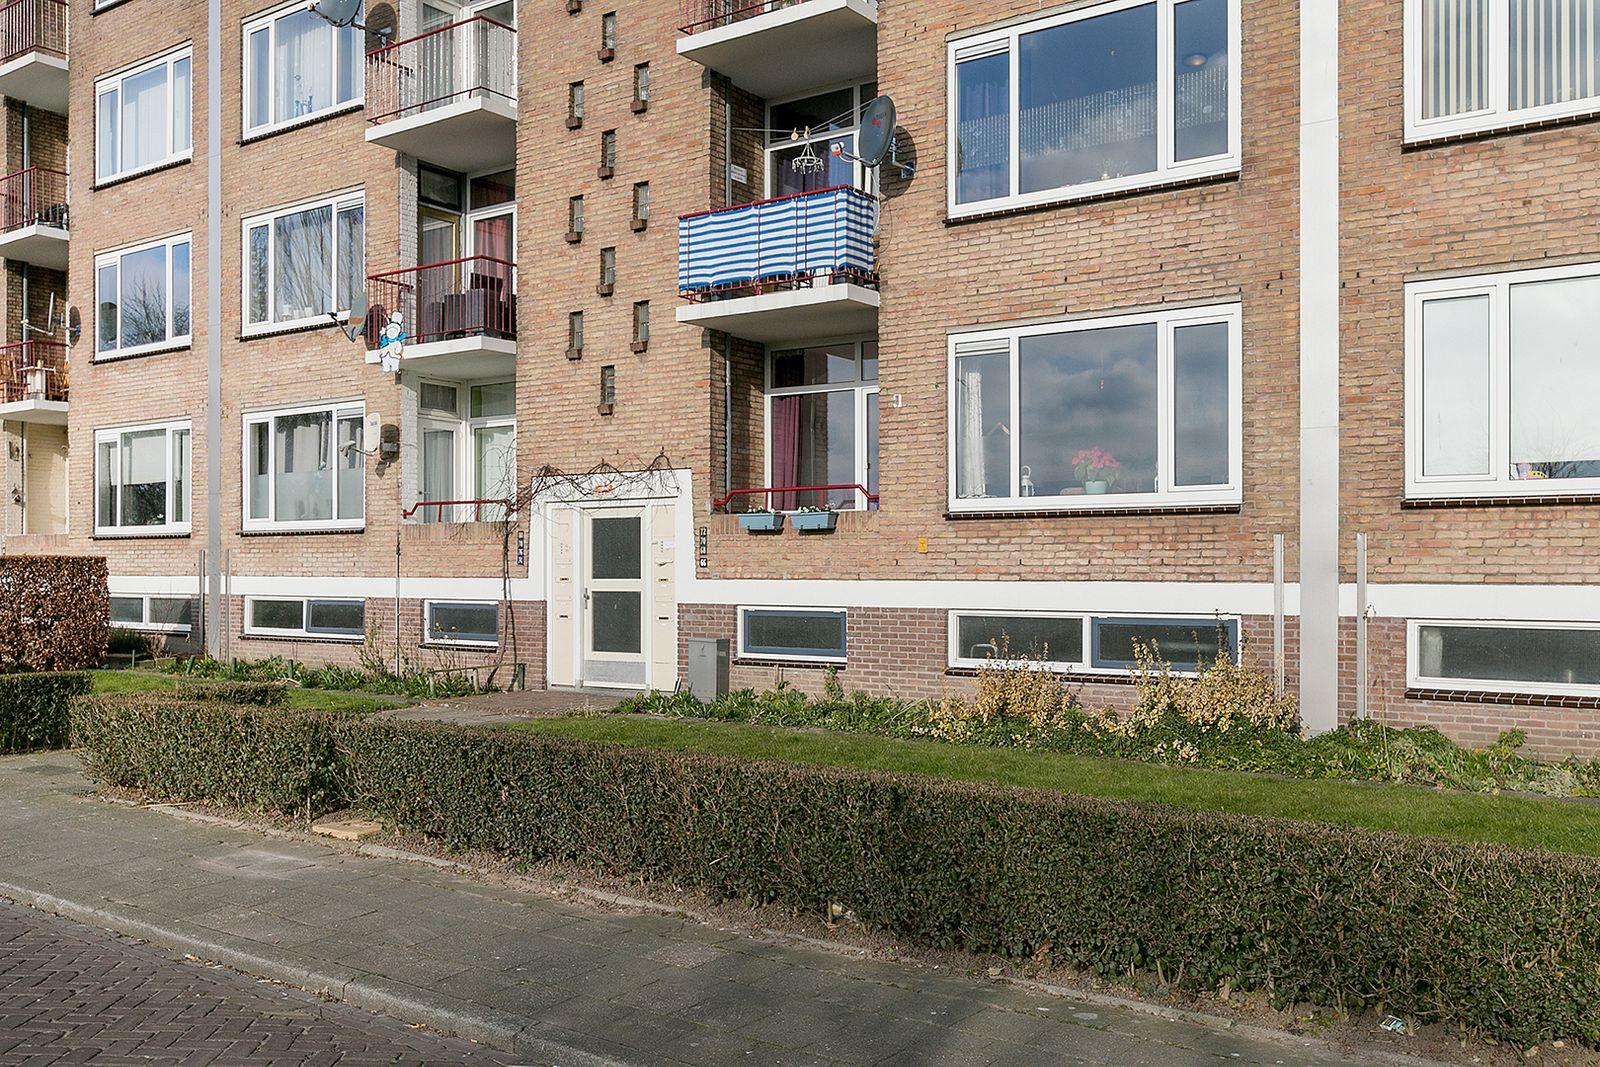 Hertog Arnoldstraat 66, Tiel